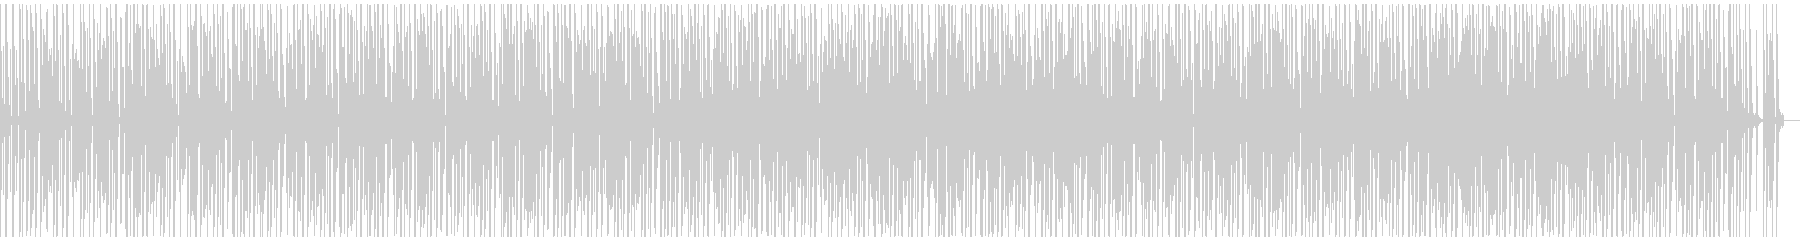 Lo-Fiビート_ファンキー&ジャジーの未再生の波形